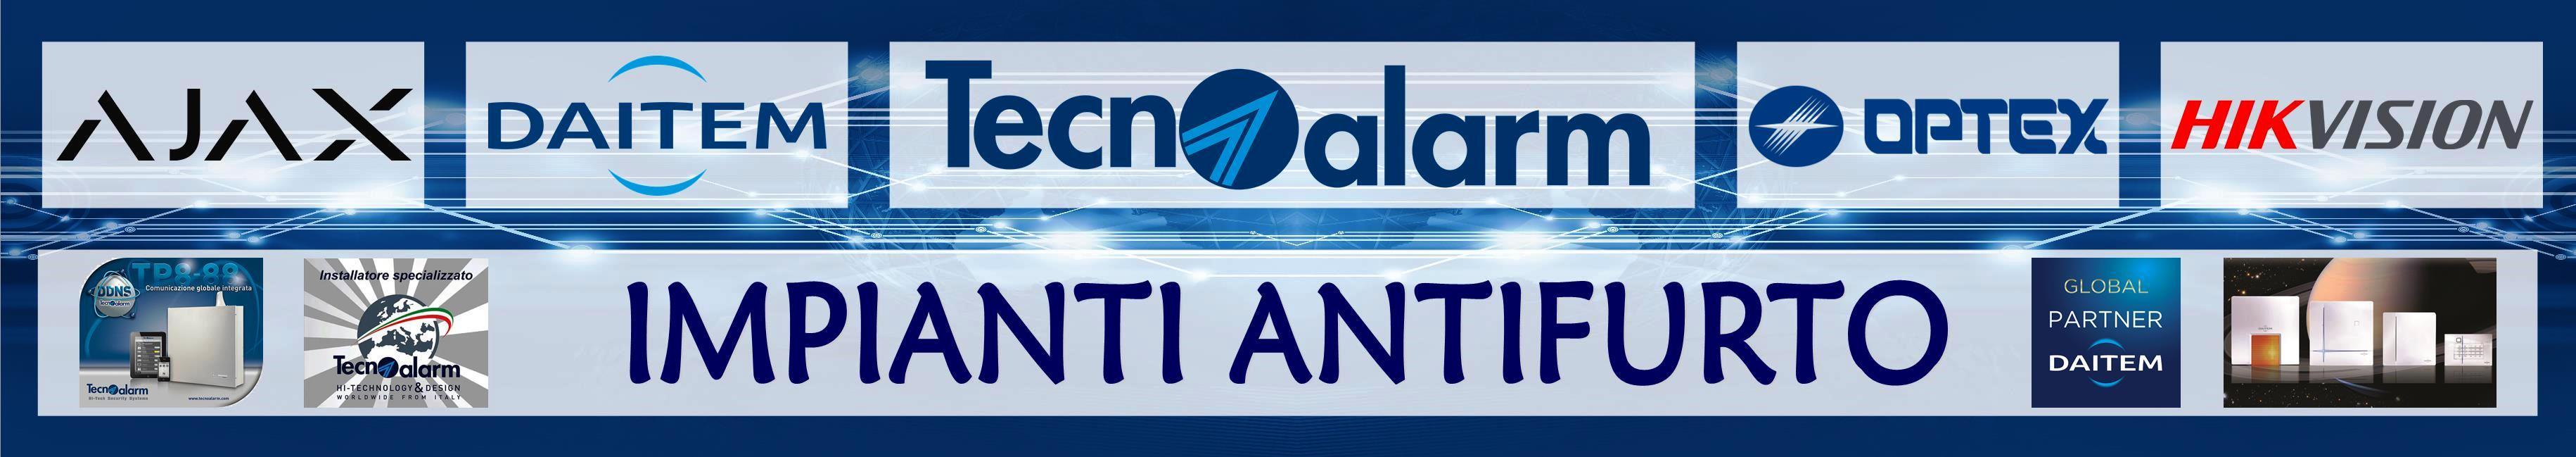 Antifurti Immagine 62 X 10